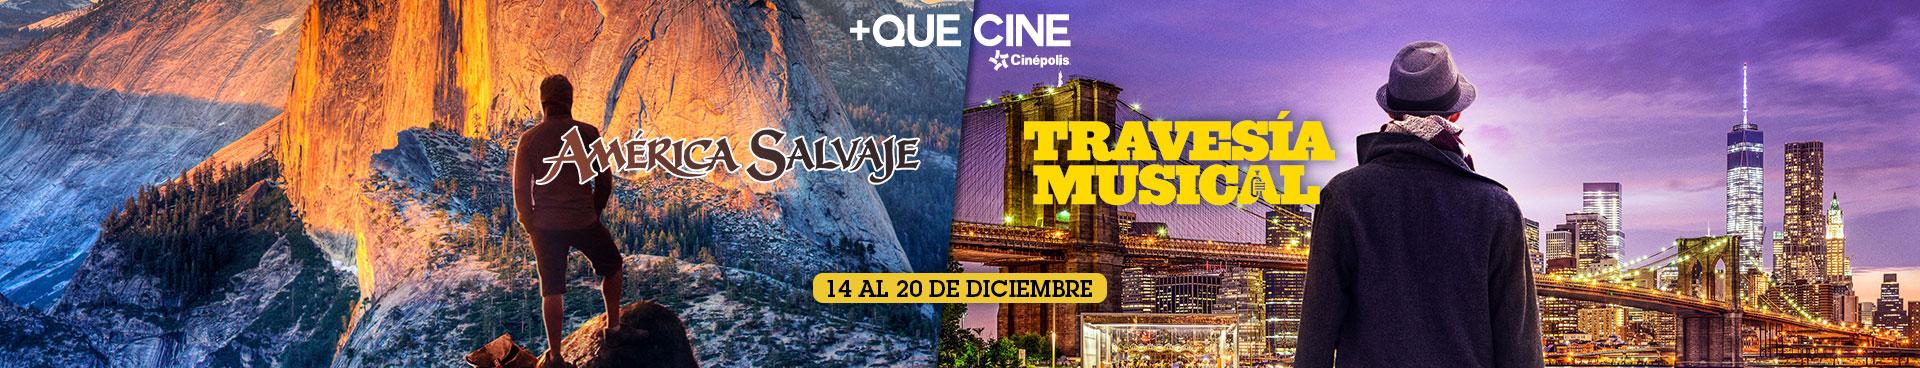 +Que Cine: América Salvaje / Travesía musical